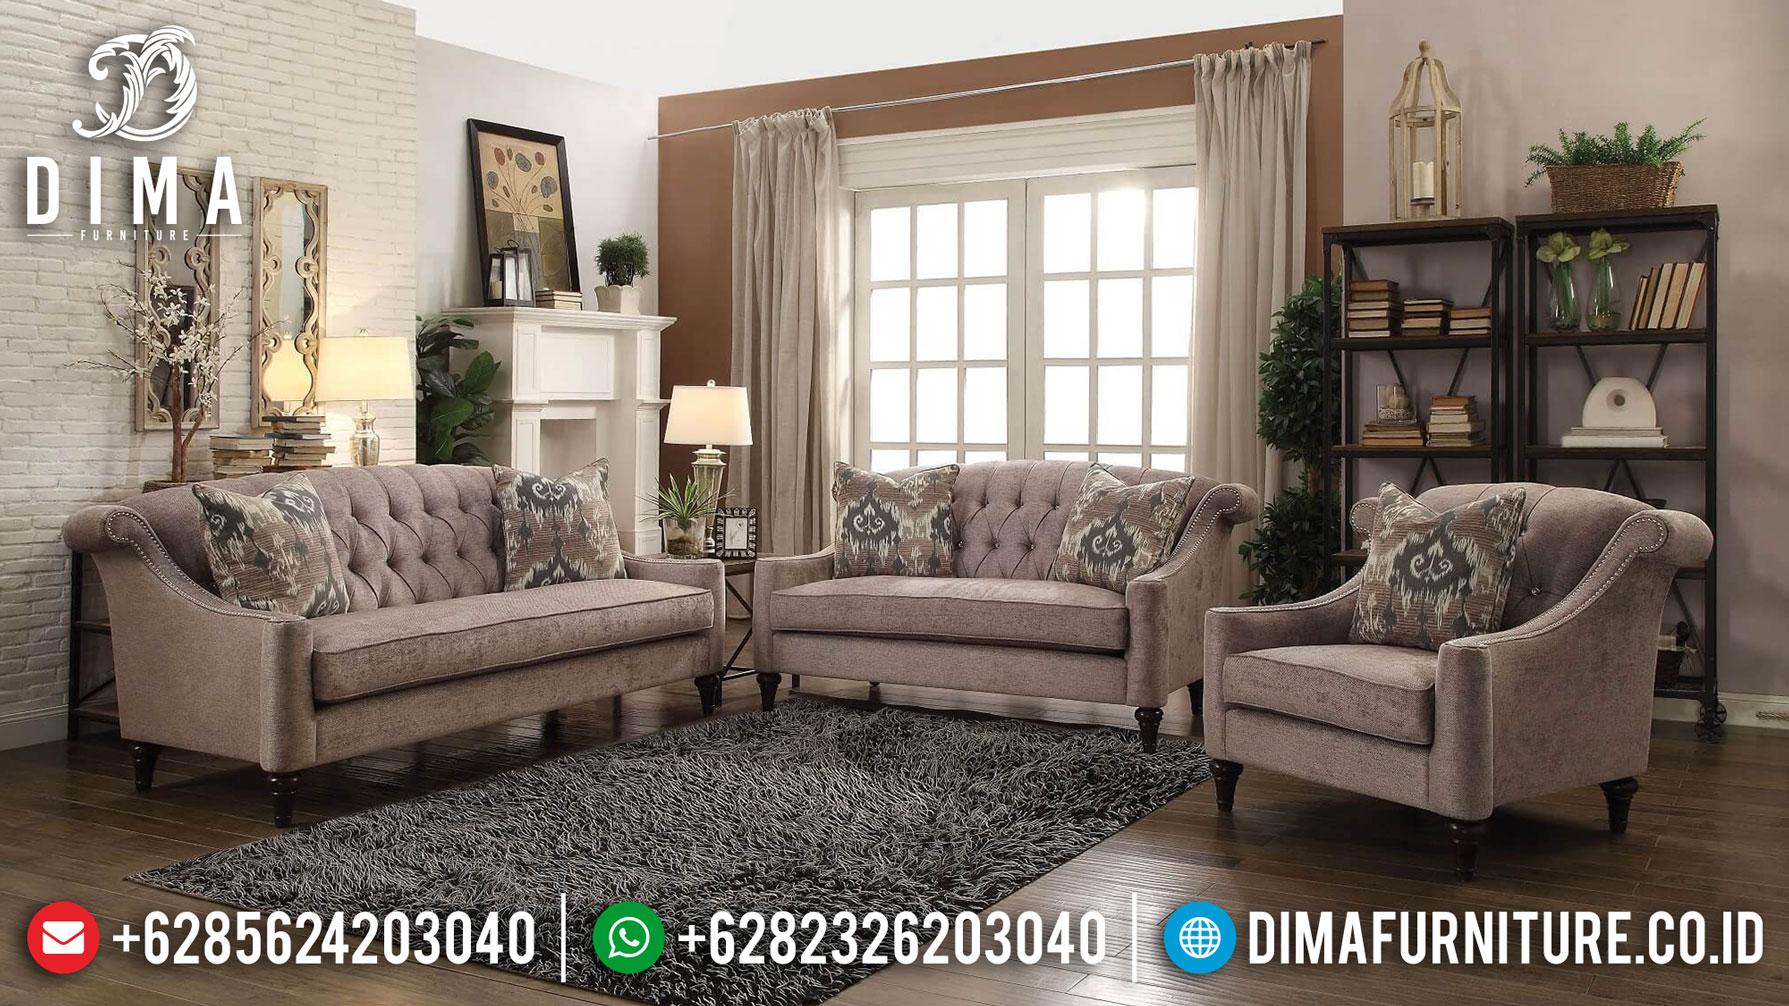 Set Sofa Tamu Minimalis Retro Classic Design New Living Room Inspiring Ttj-1270